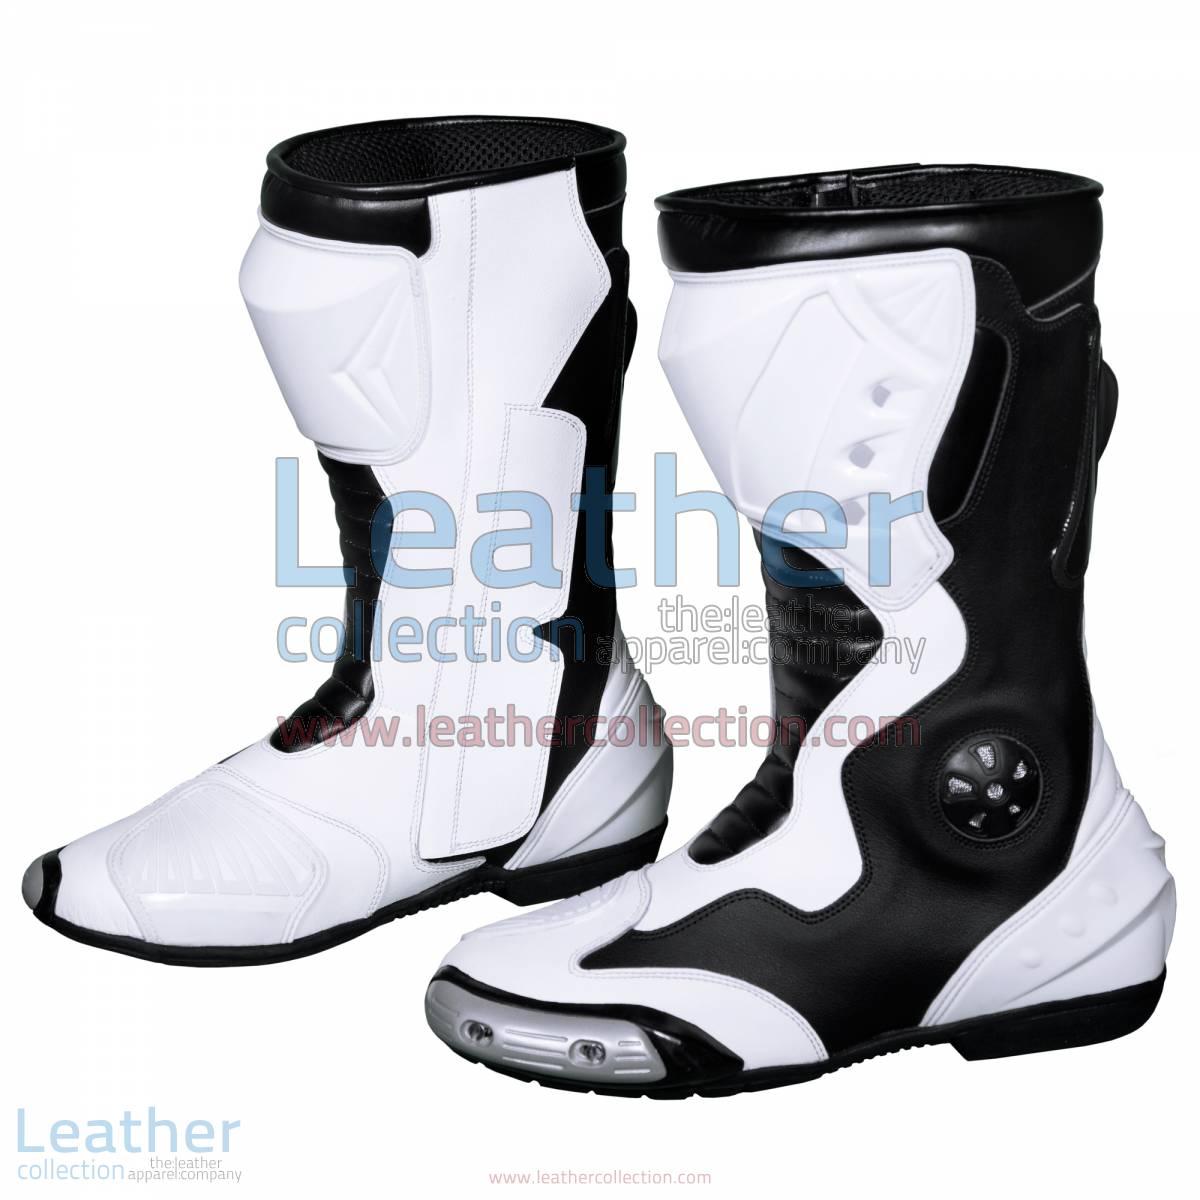 Alex Rins MotoGP 2017 Leather Racing Boots | Alex Rins MotoGP 2017 Leather Racing Boots